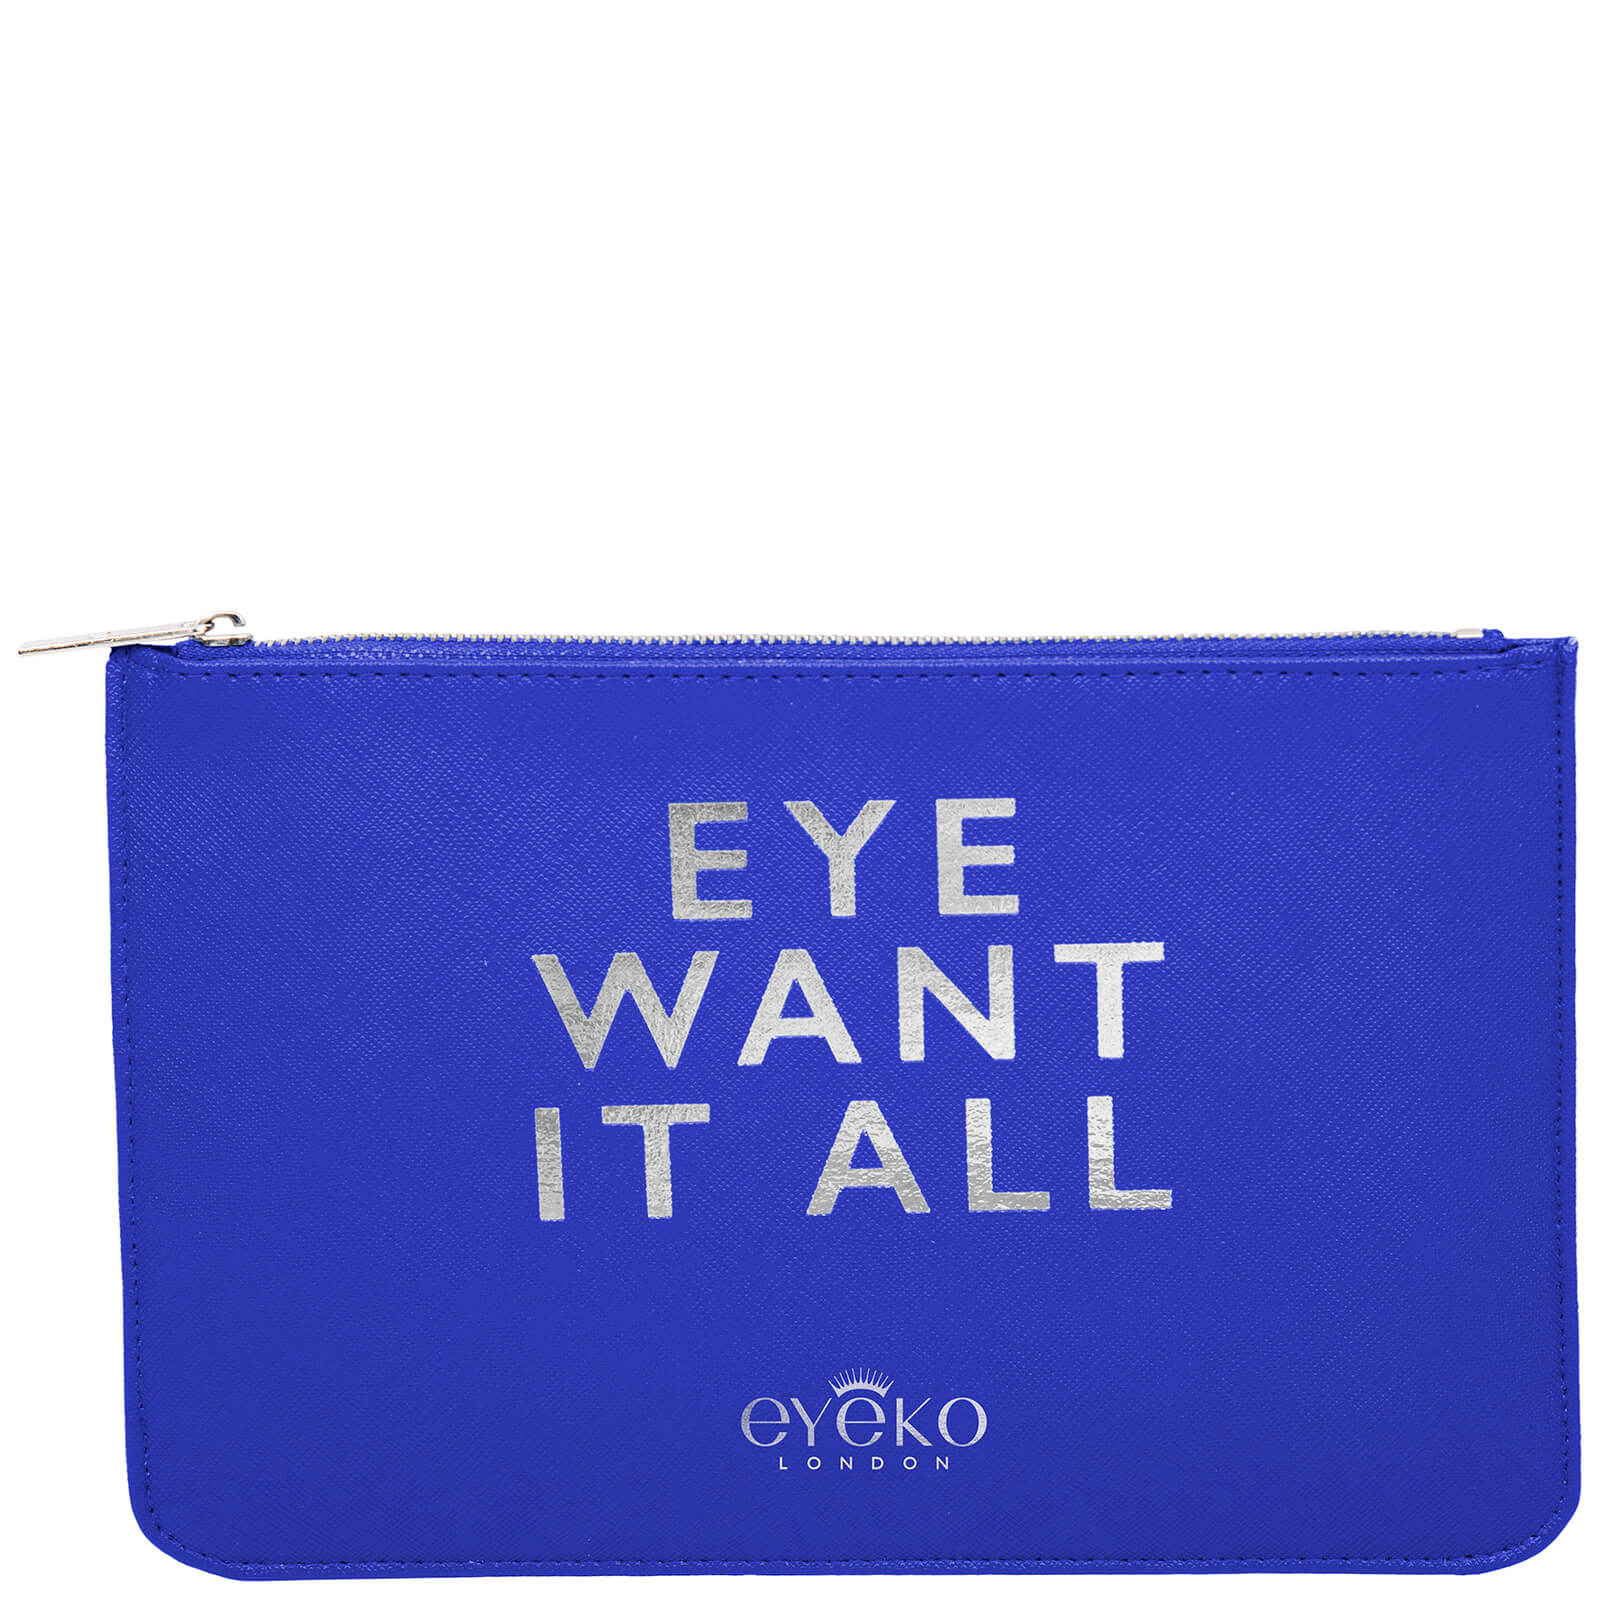 Eyeko Makeup Bag Lookfantastic